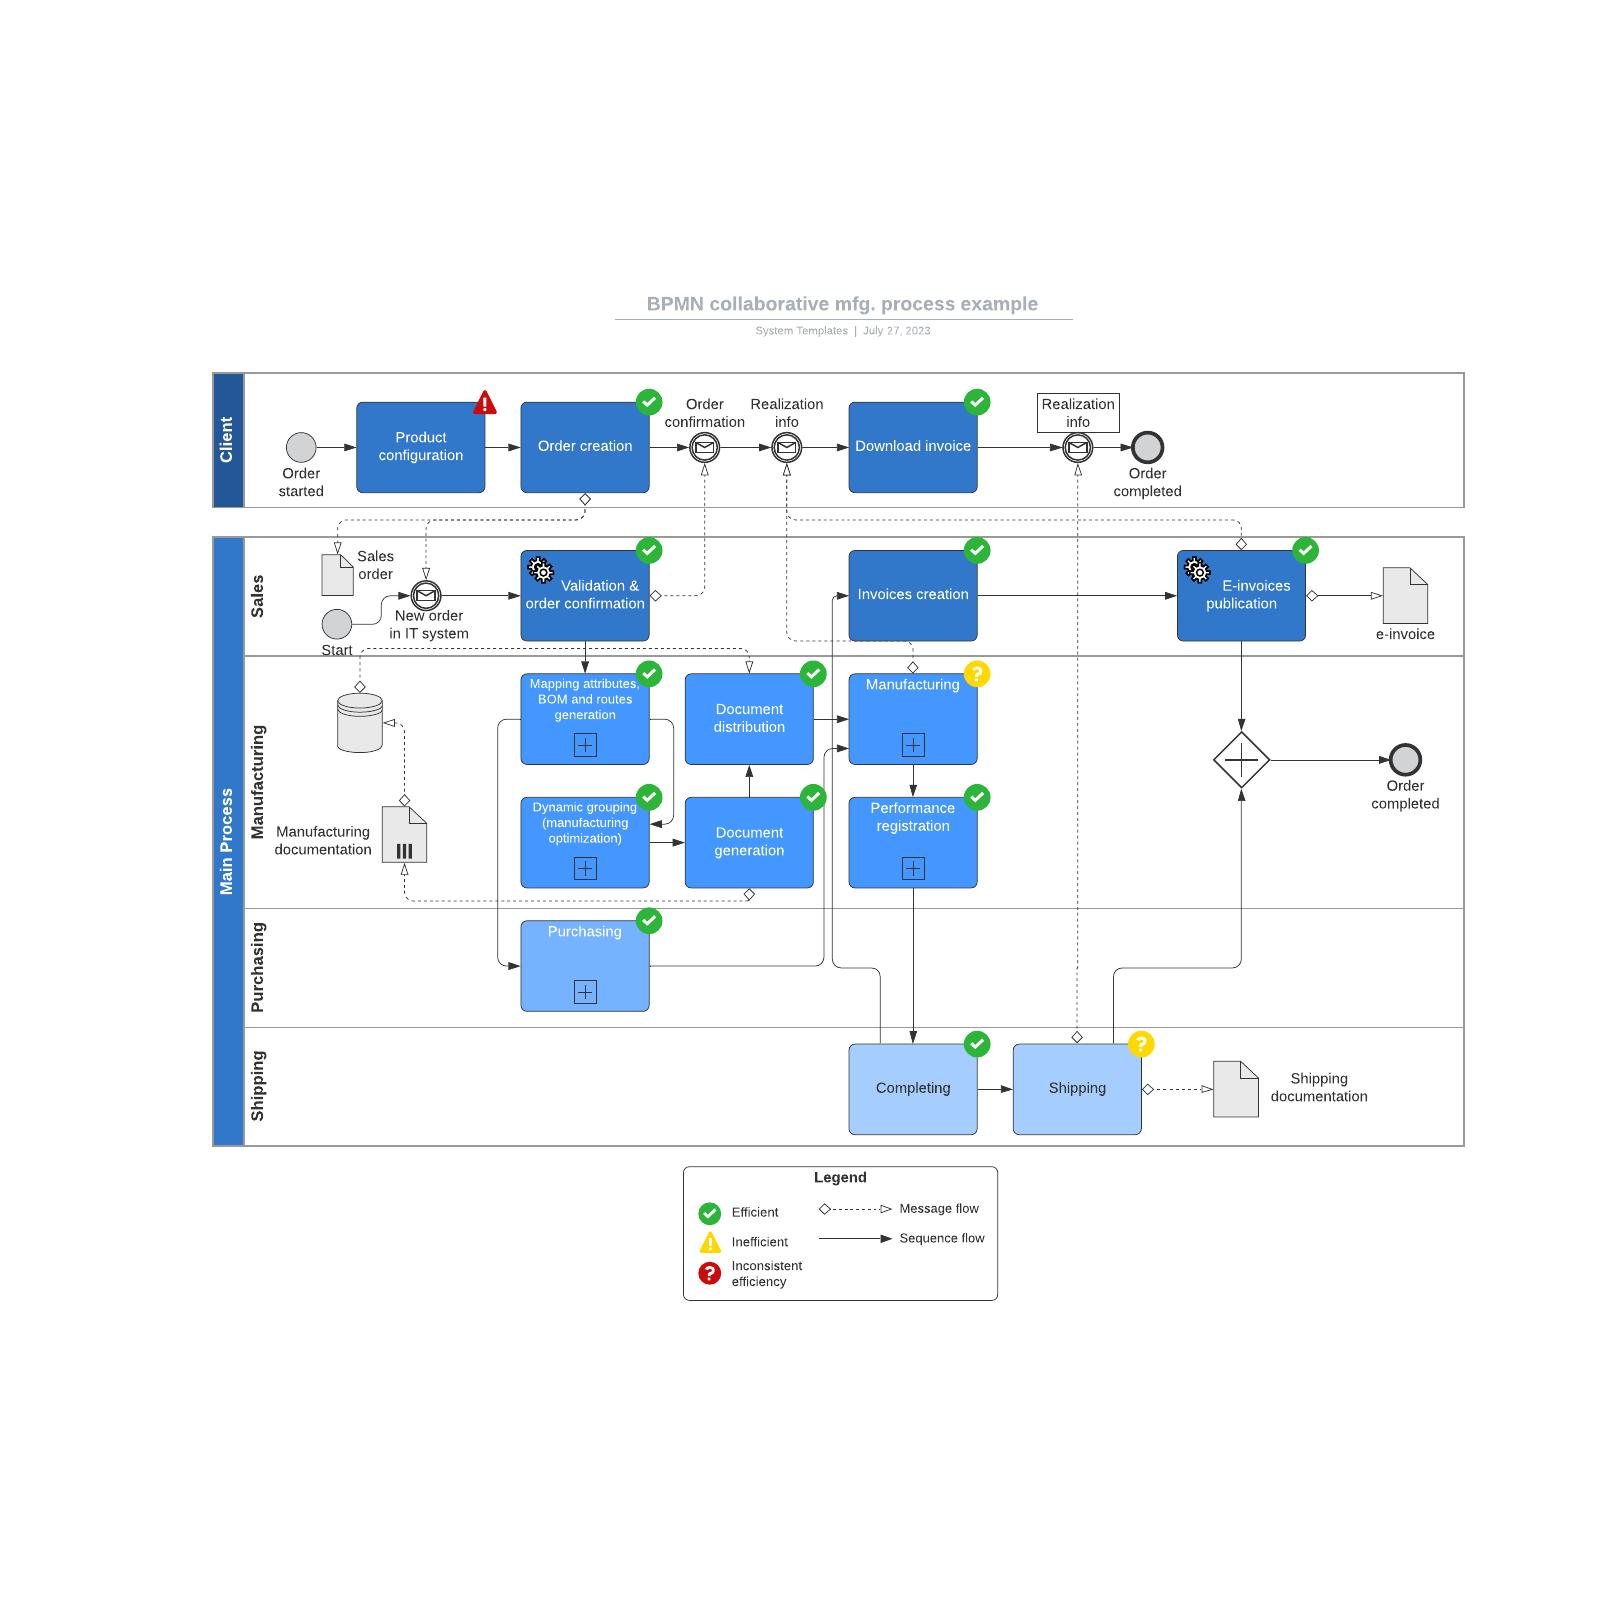 BPMN collaborative mfg. process example